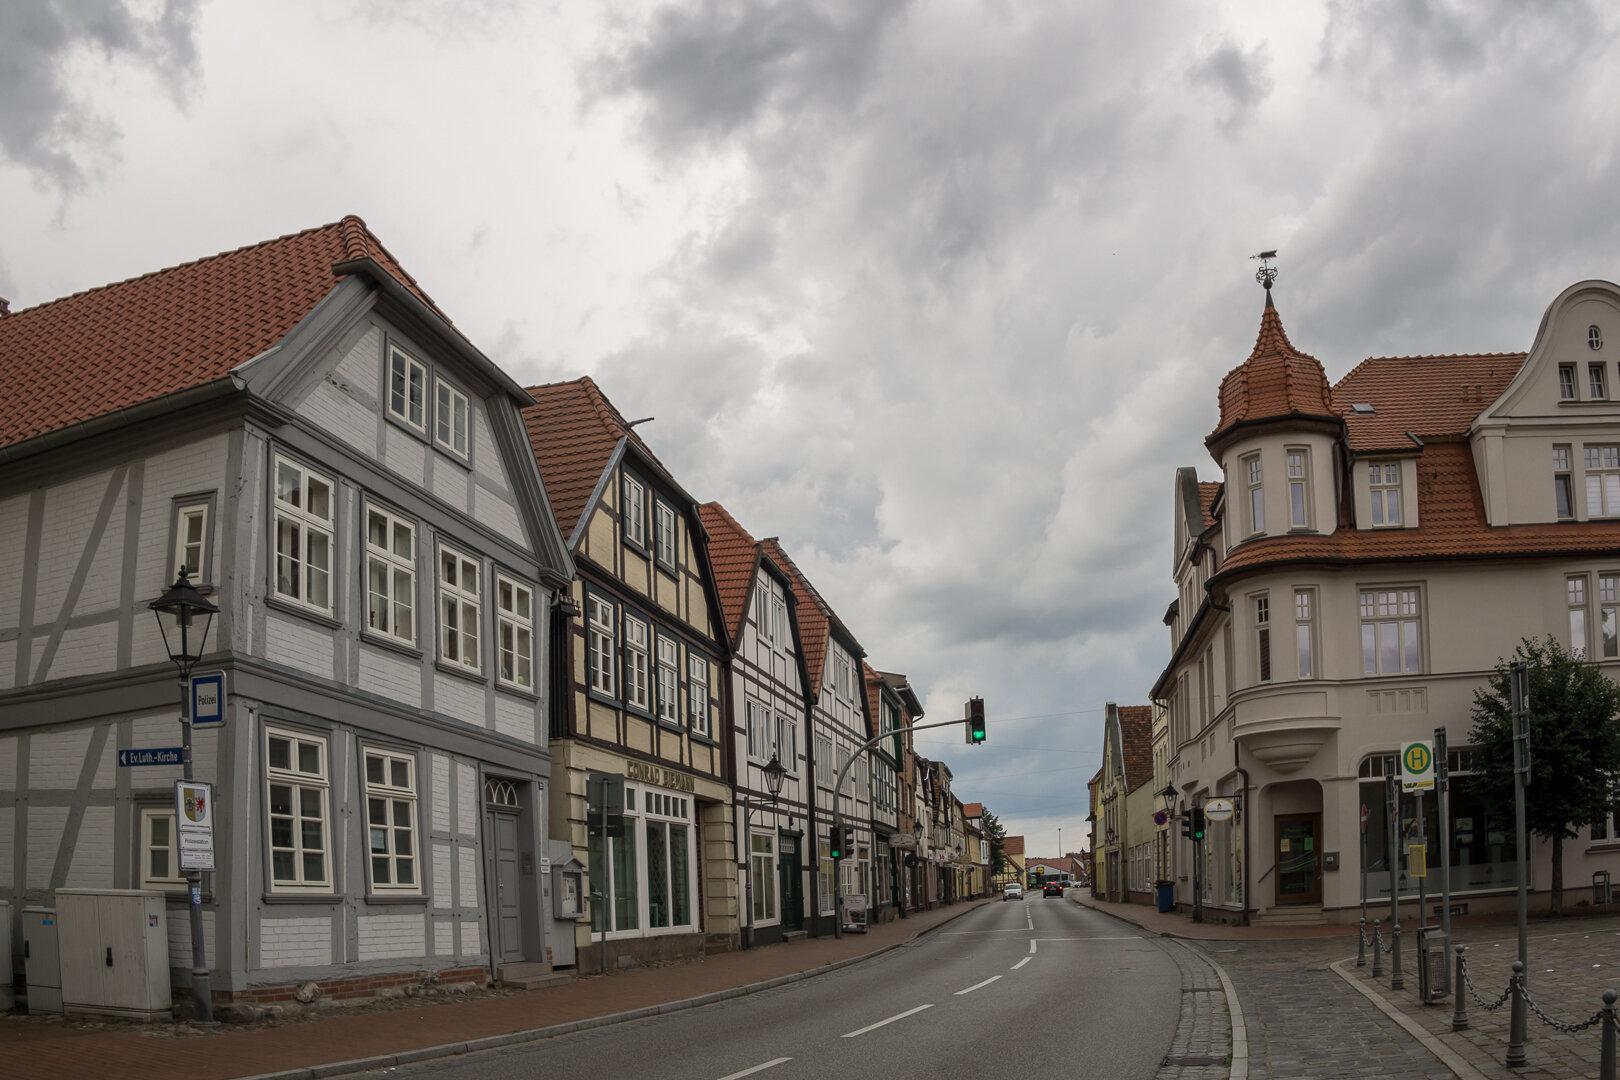 Gro_e_Stra_e_vom_Markt_Richtung_Kreisverkehr